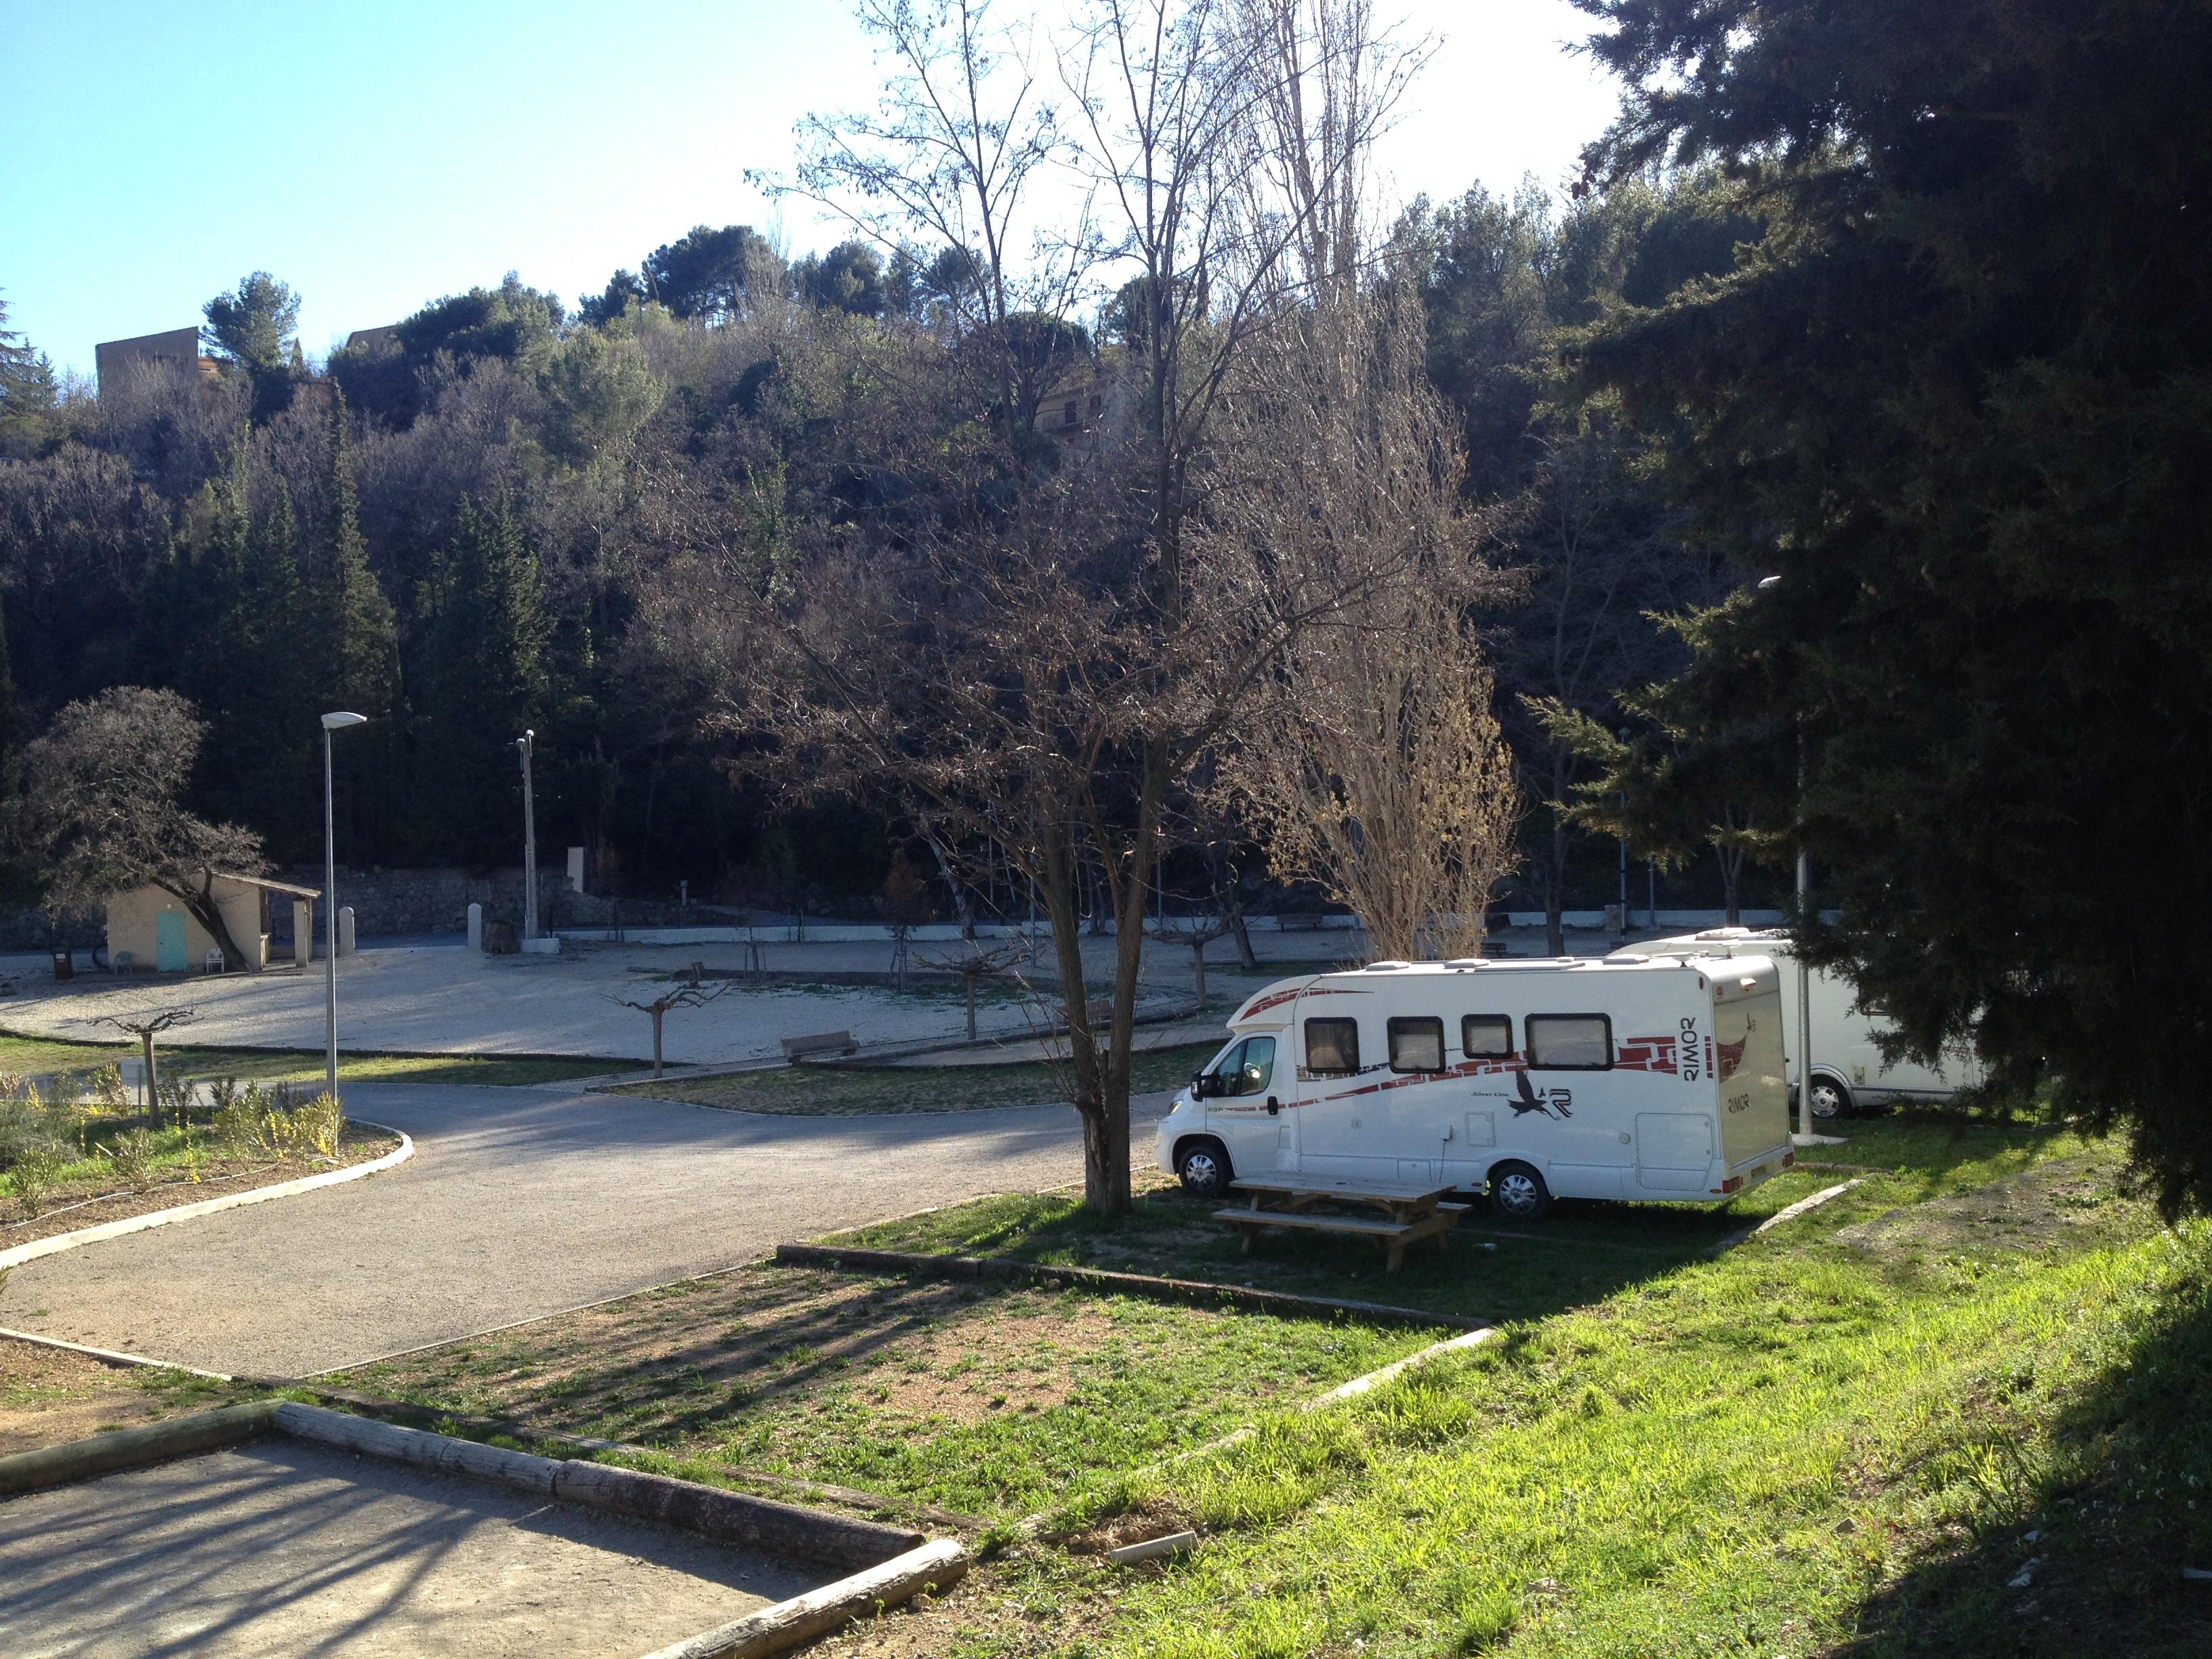 Aire d'accueil de camping car